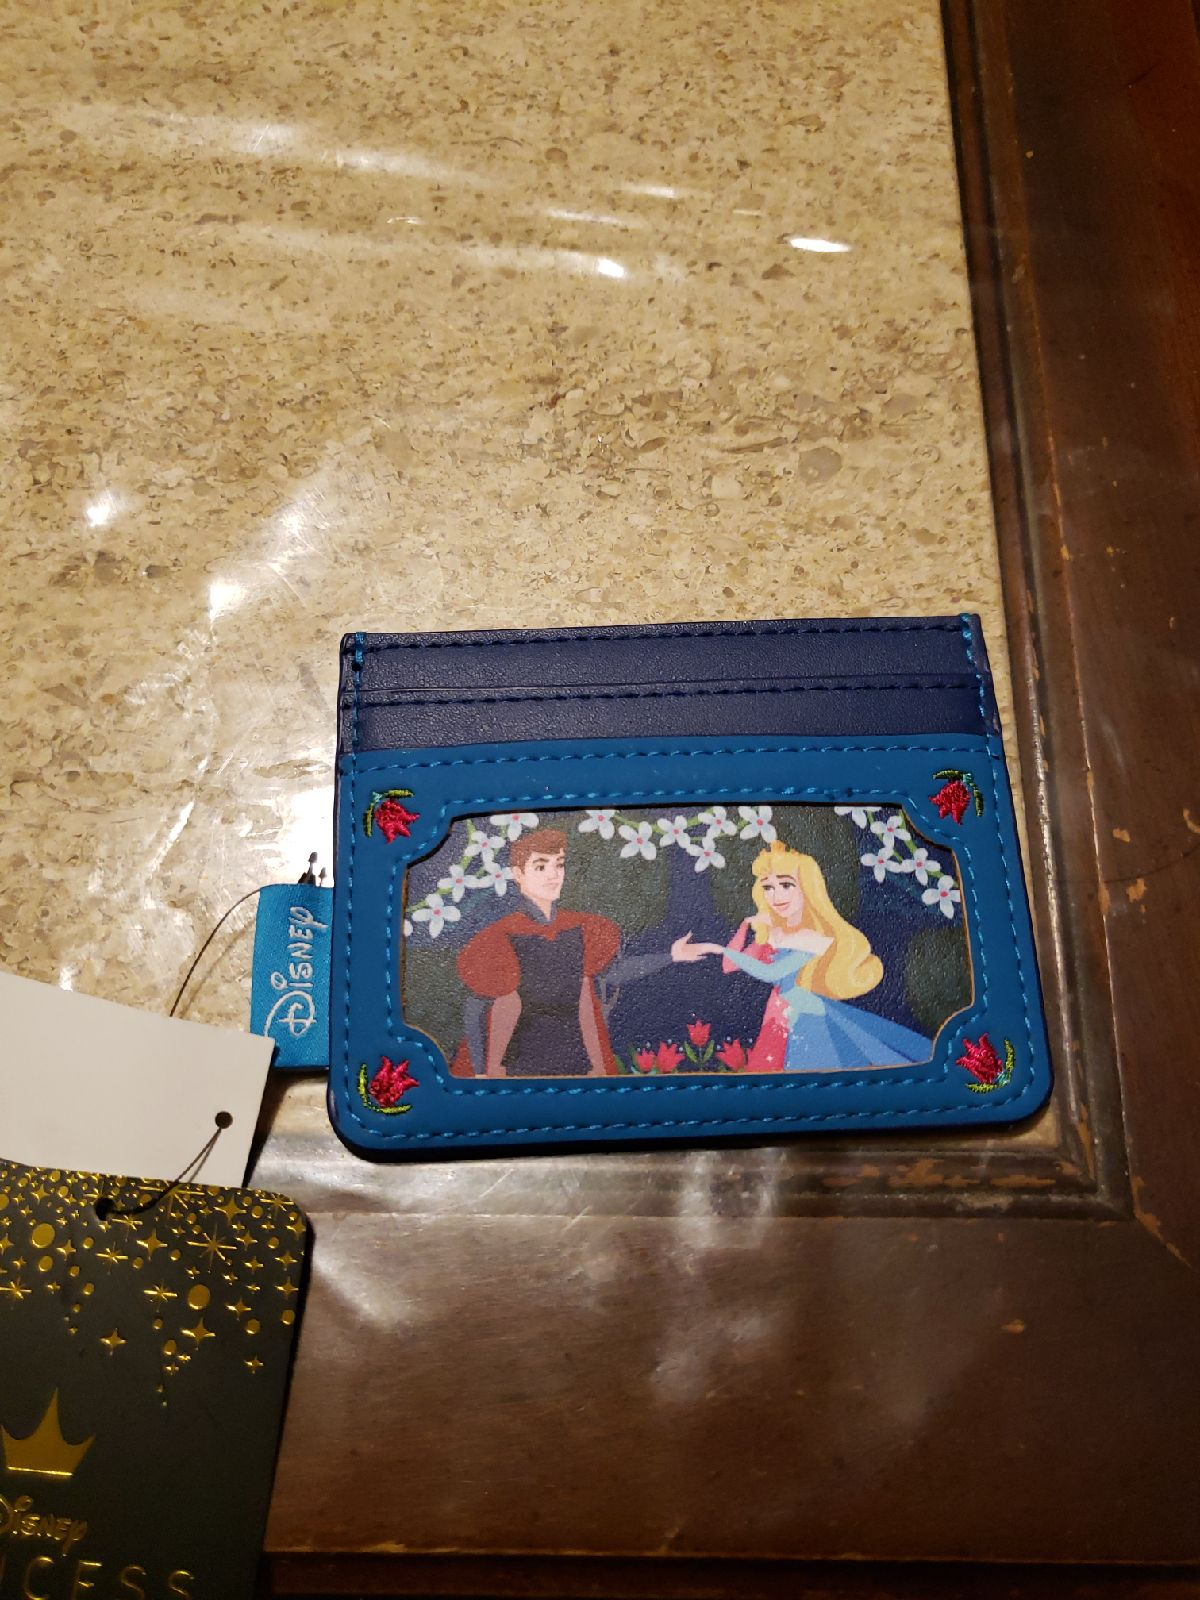 Sleeping beauty Loungefly Card holder